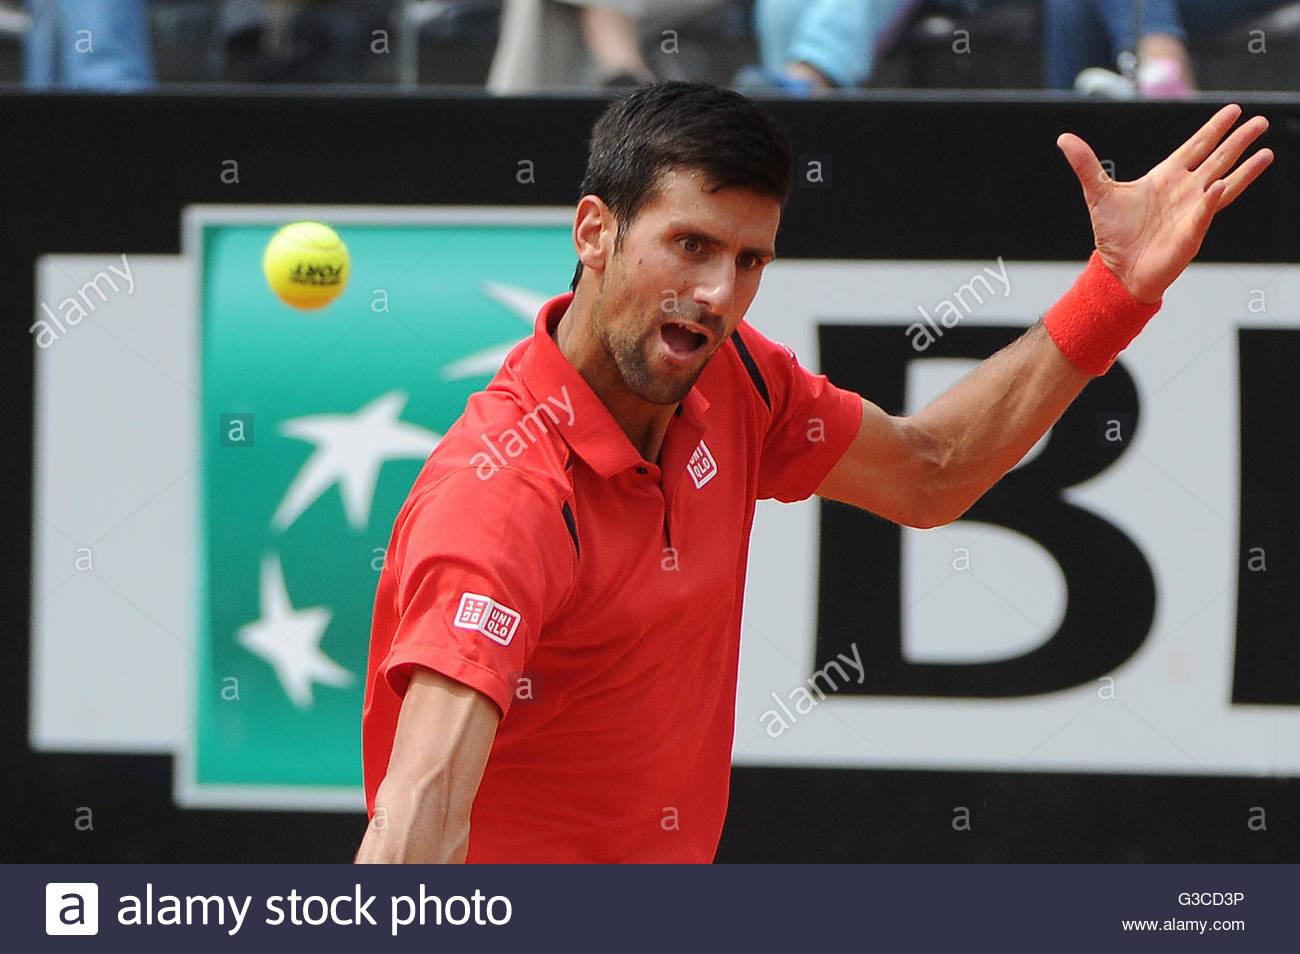 novak djokovic vs stephane robert,interanzionali di tennis bnl d'italia,roma 2016 - Stock Image